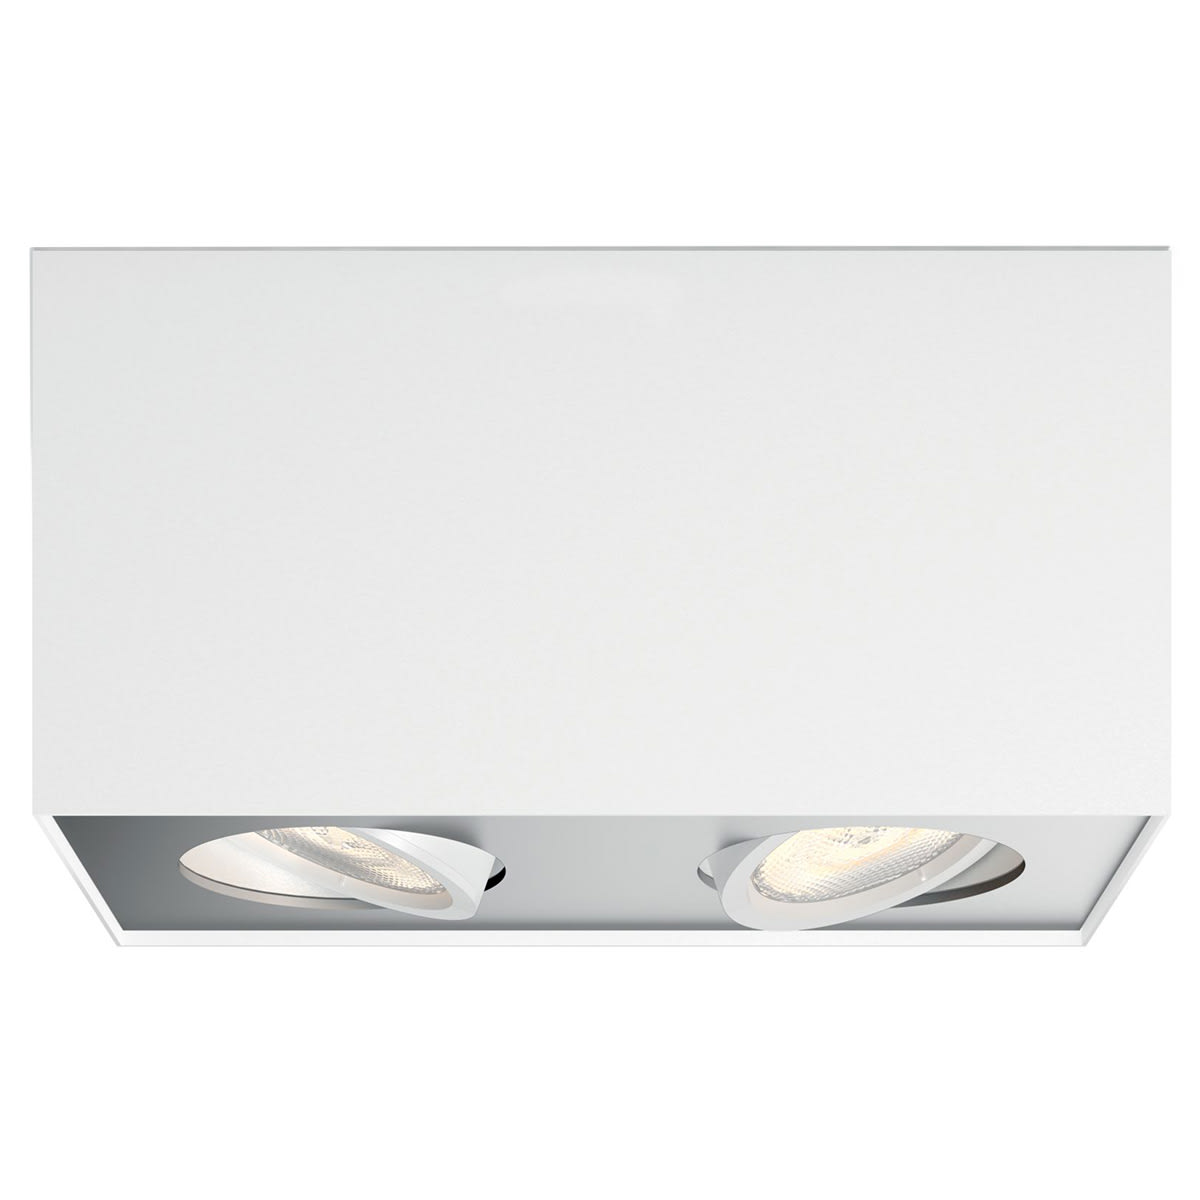 Med 2 justerbare spots - Inkl. LED-lyskilde